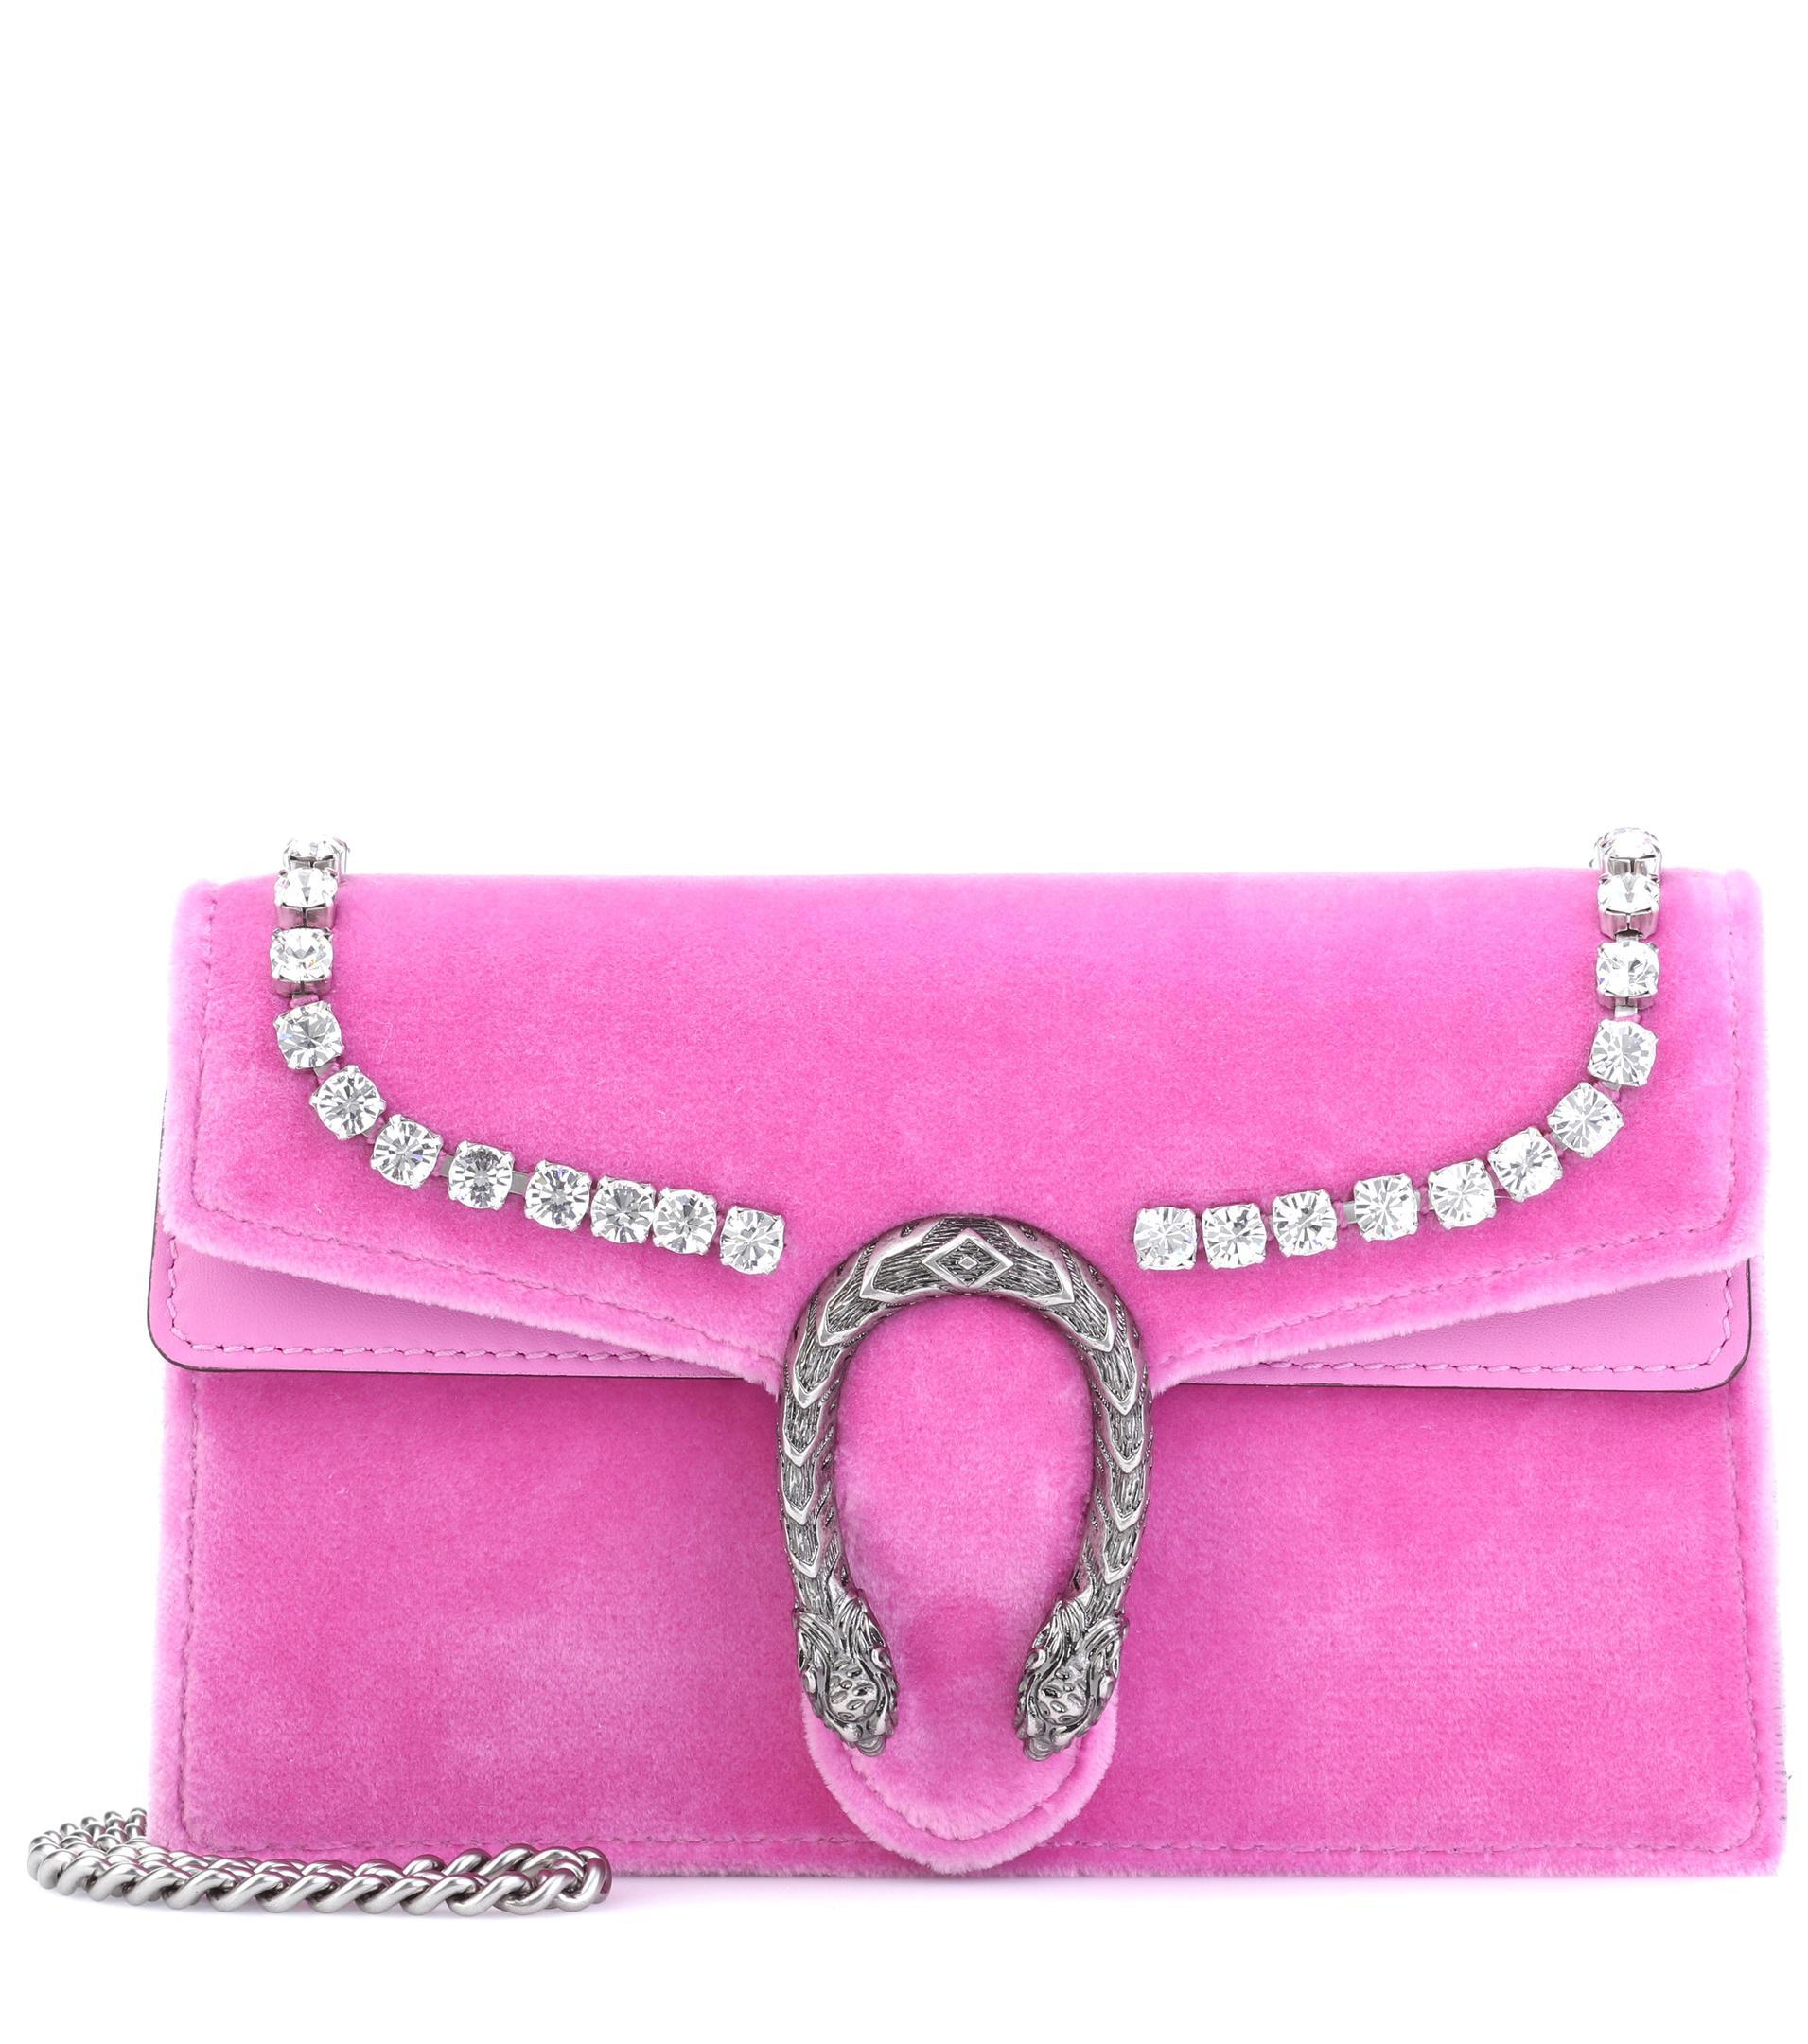 2b656b74d48 Women GG Blooms Dionysus Zipped Purse Color--PINK